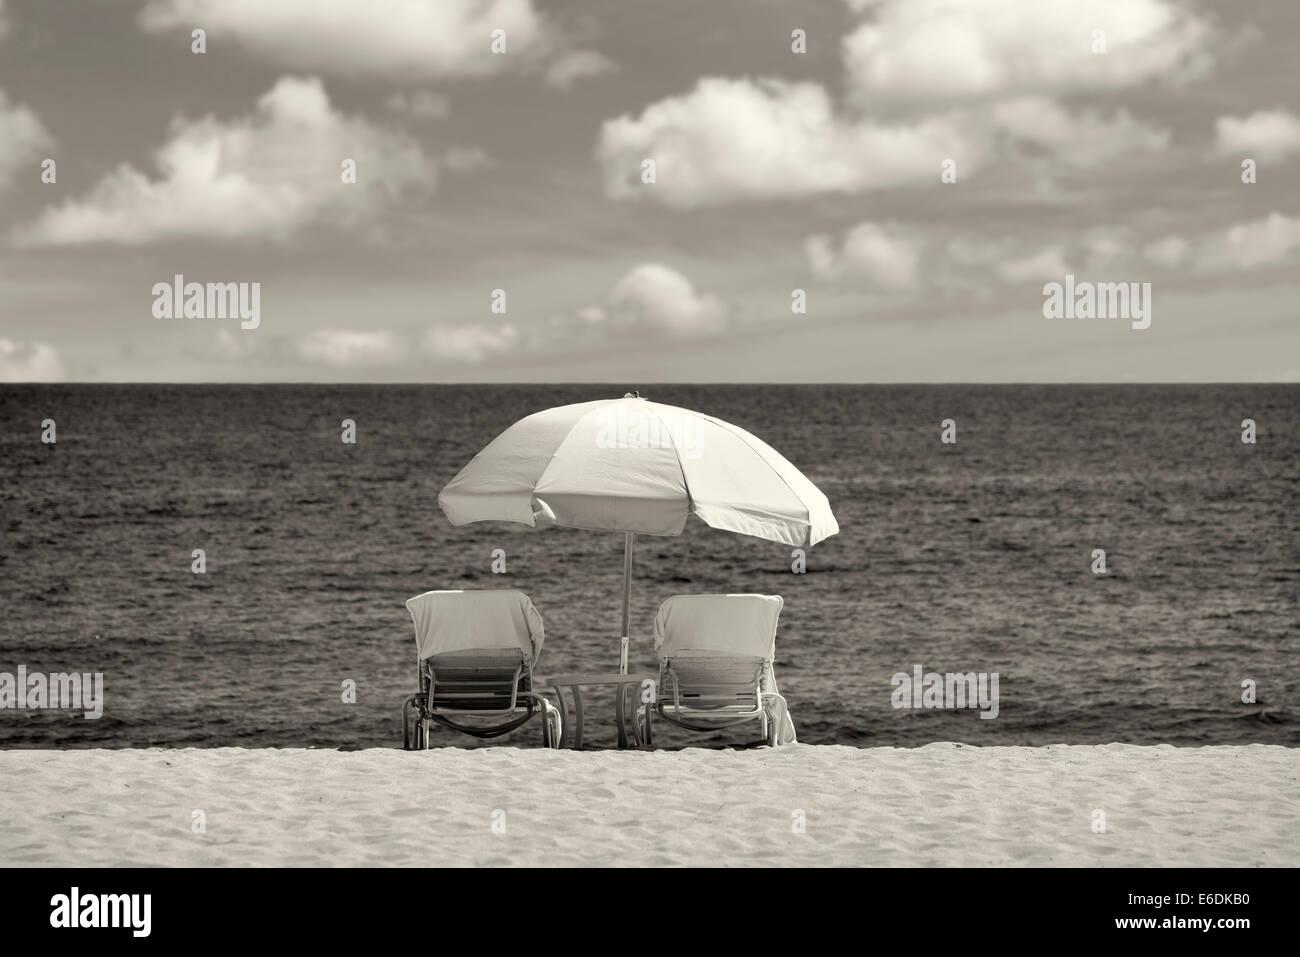 Beach umbrella and chairs. Beach at Four Seasons, Lanai, Hawaii. - Stock Image